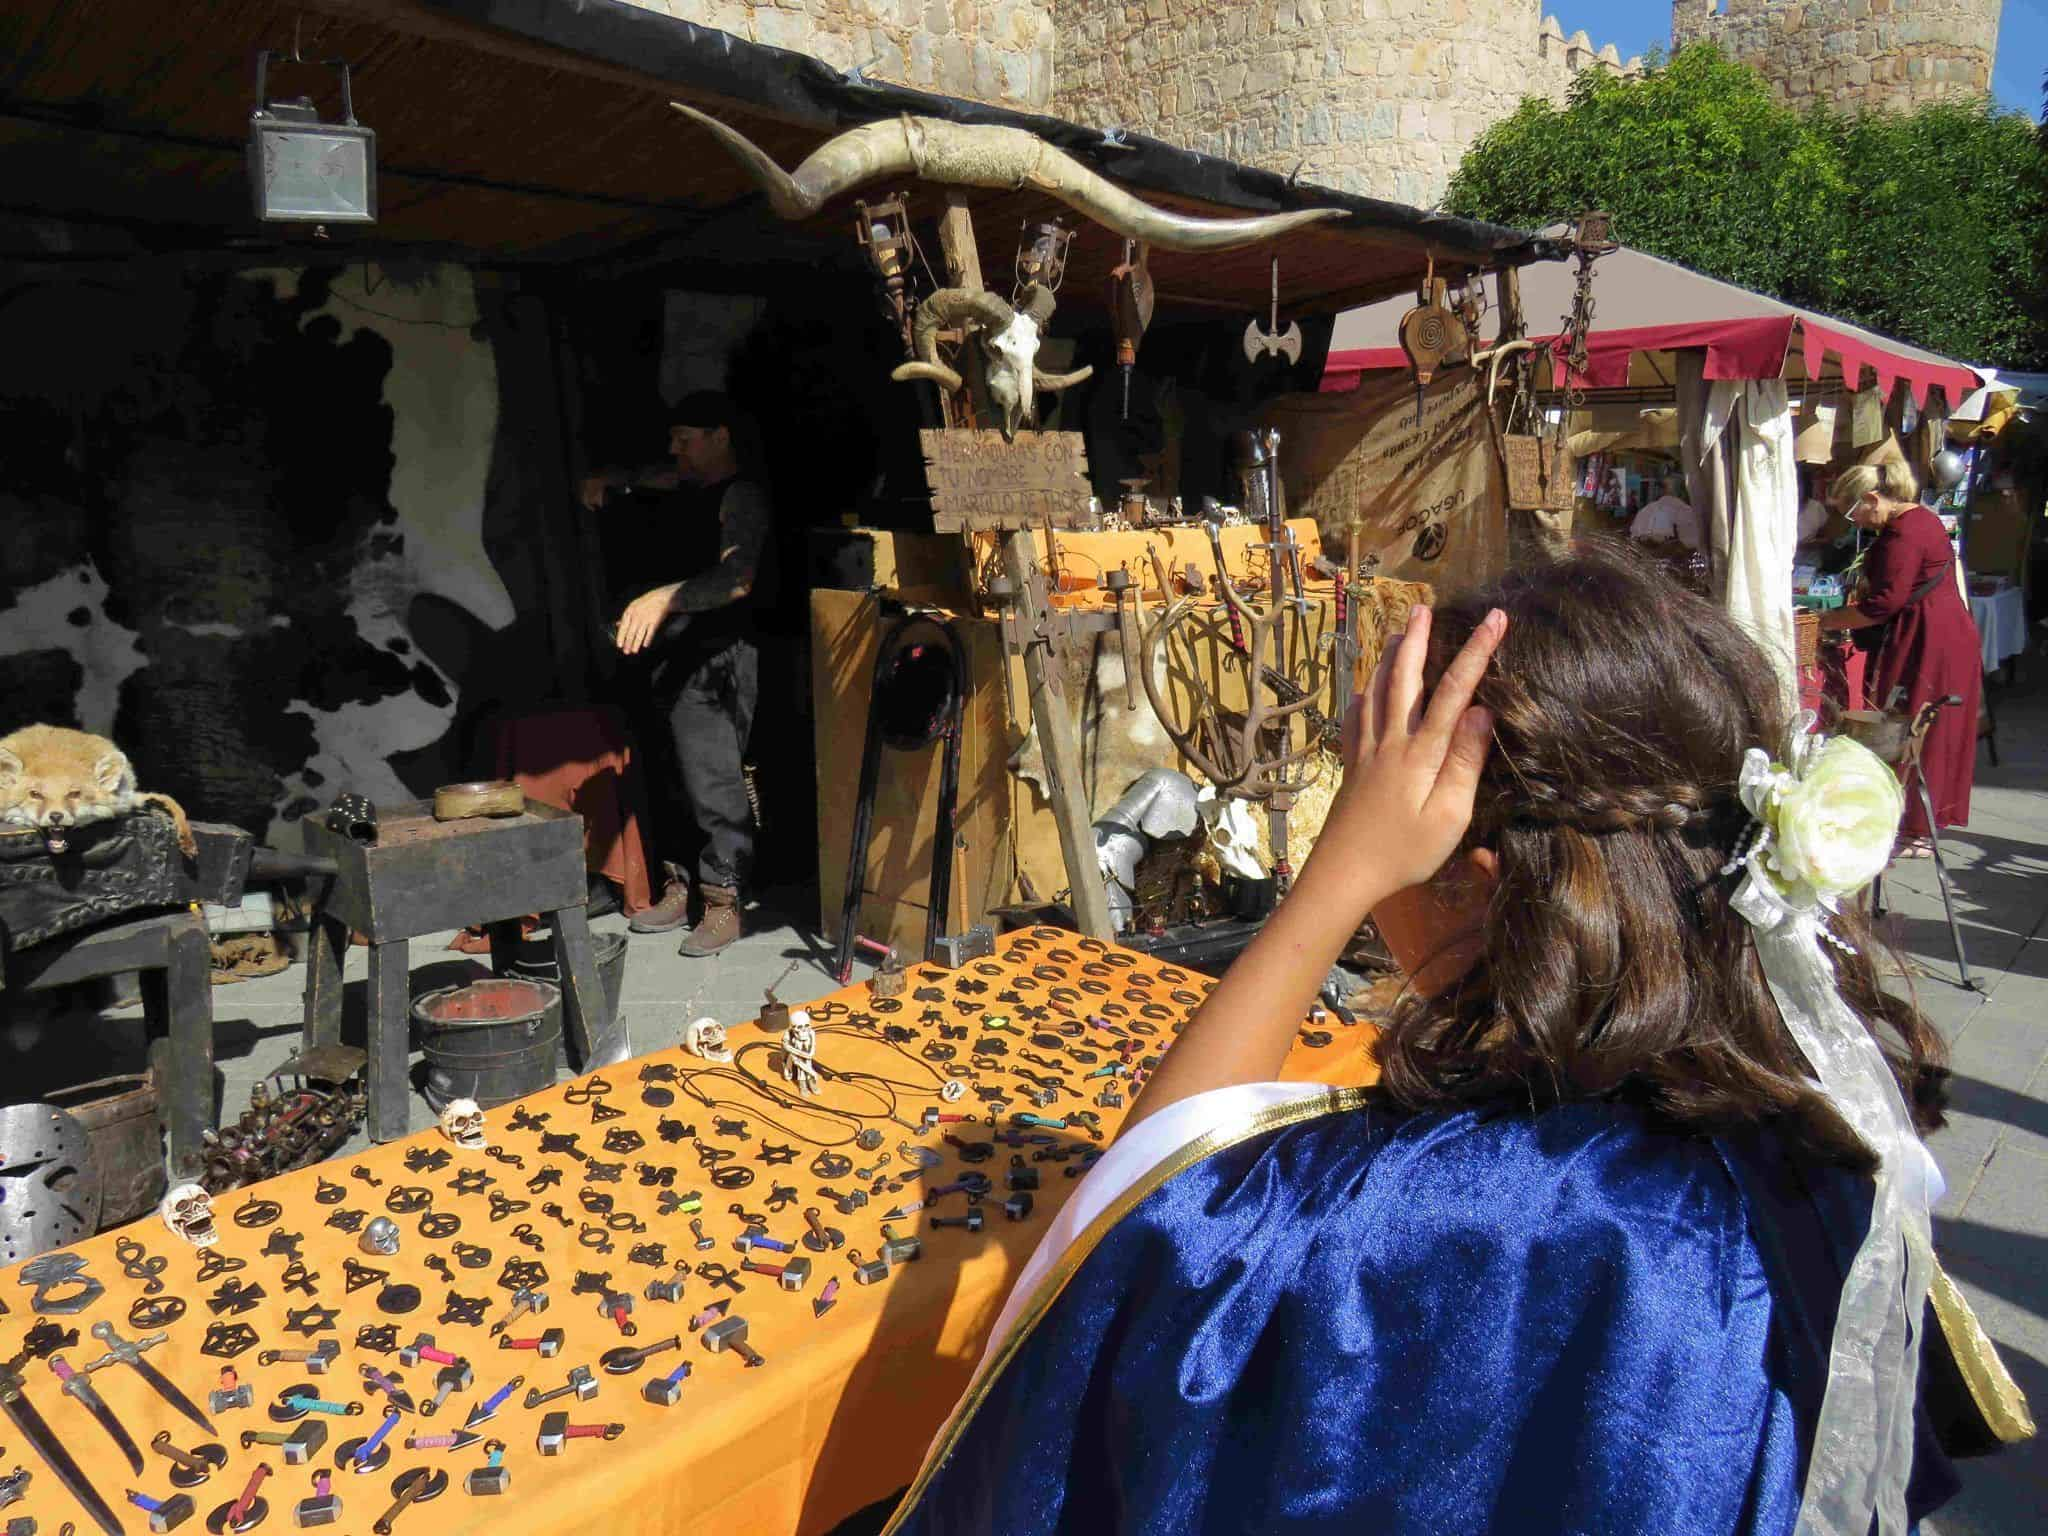 mercado medieval de Avila